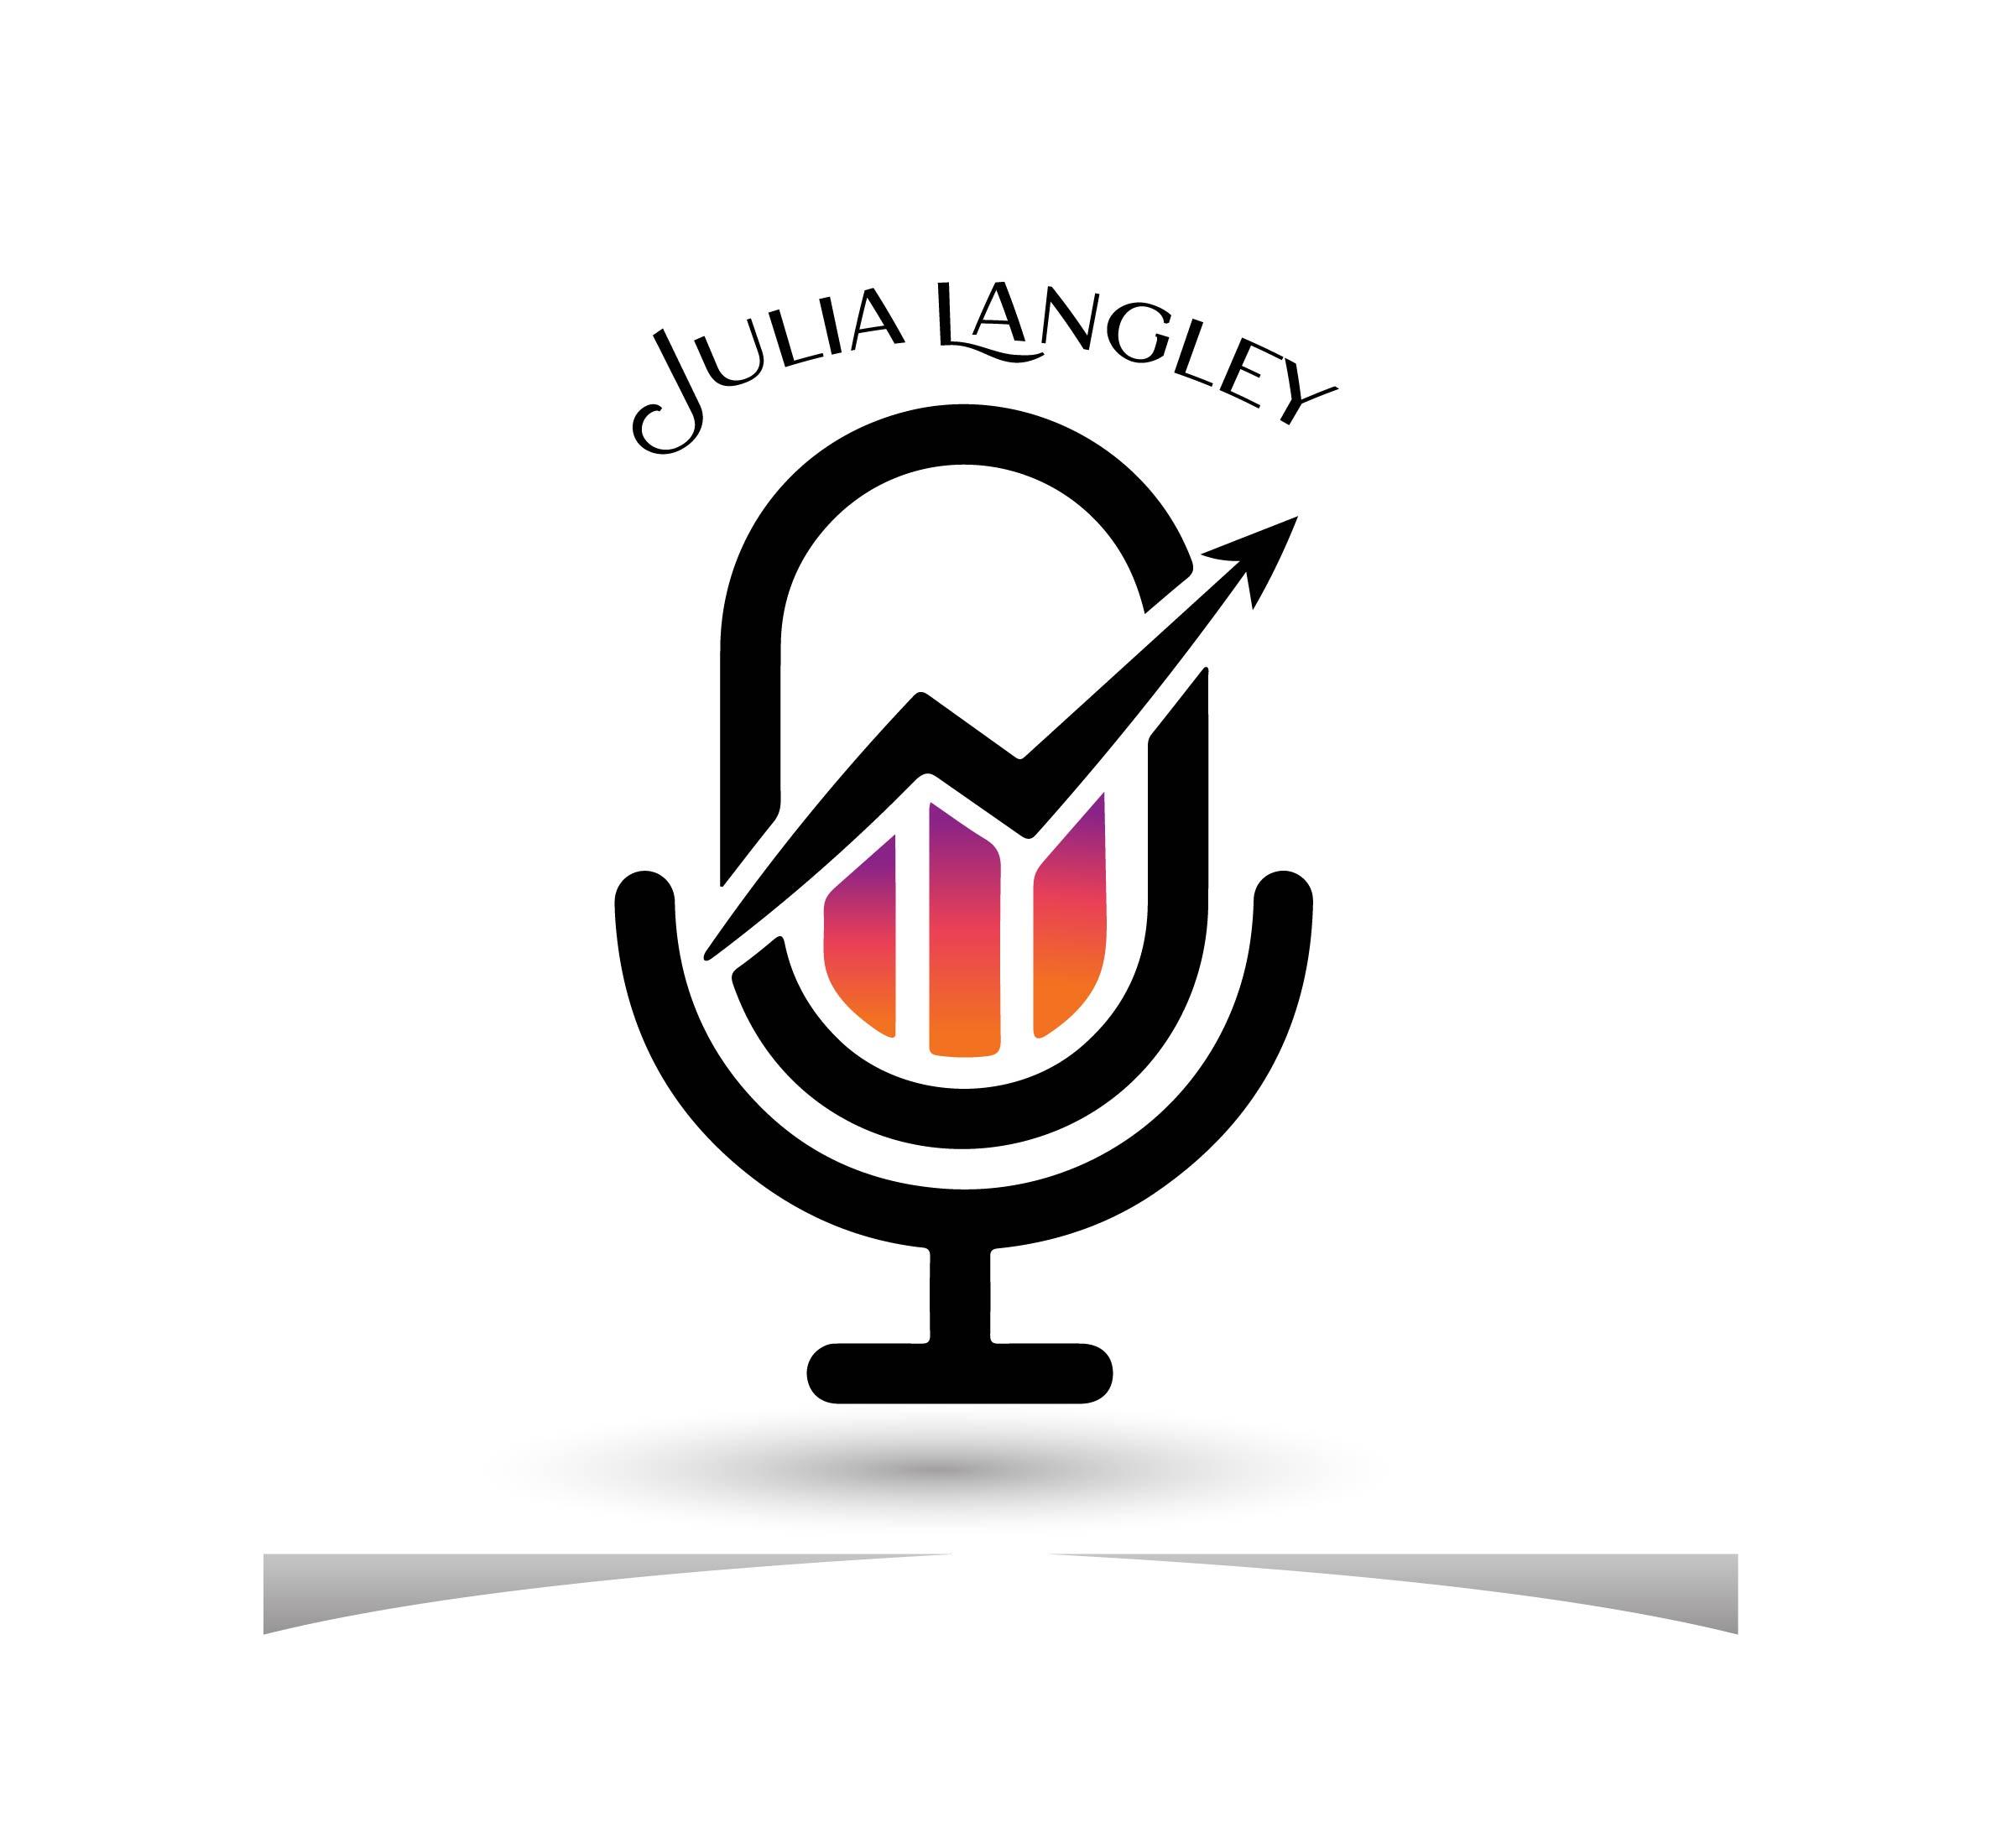 Julia Langley - Graceful Warrior